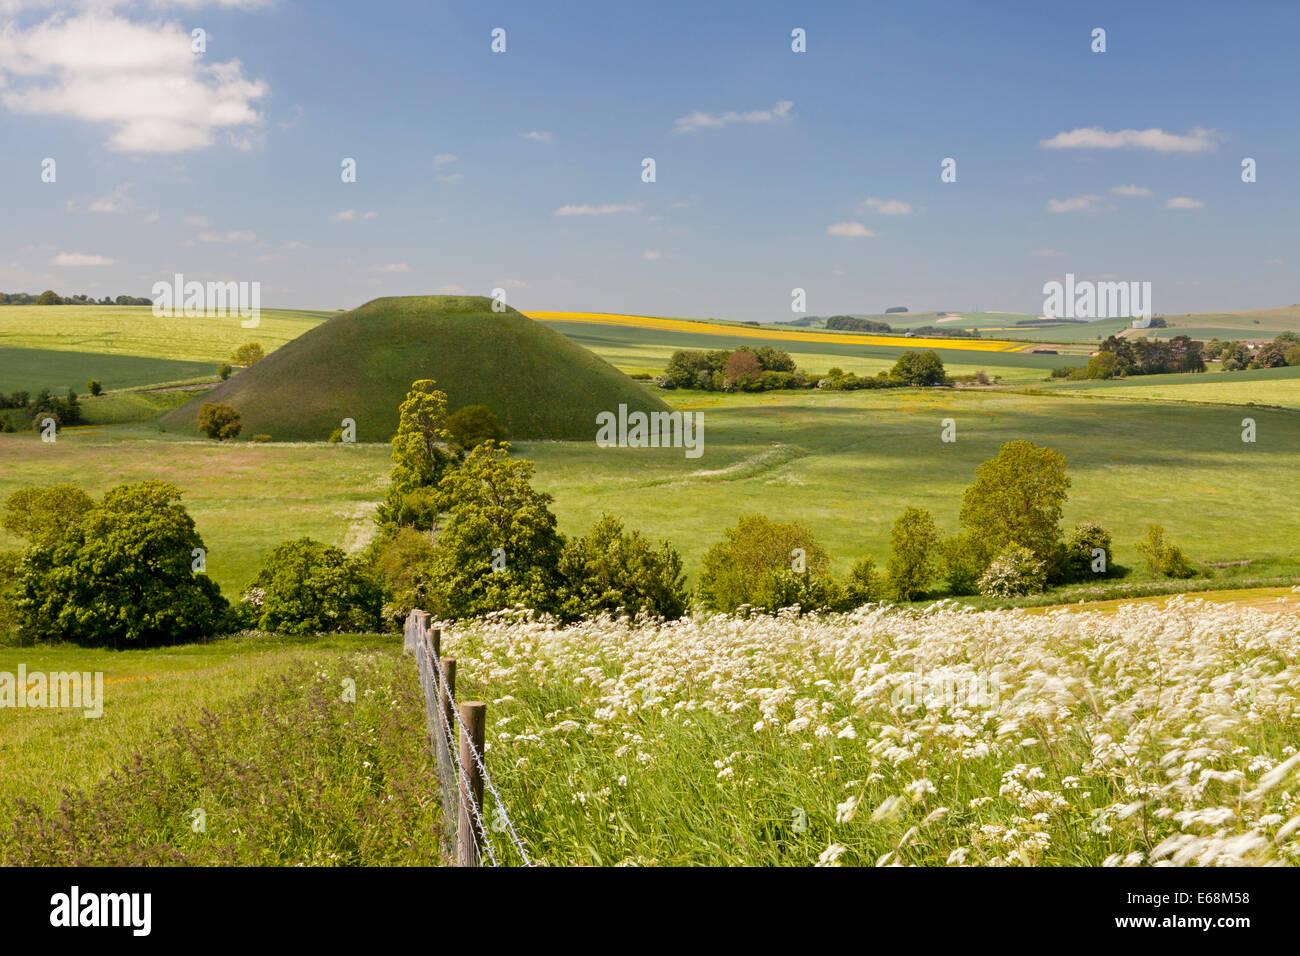 Silbury Hill near Avebury in Wiltshire, England. Stock Photo